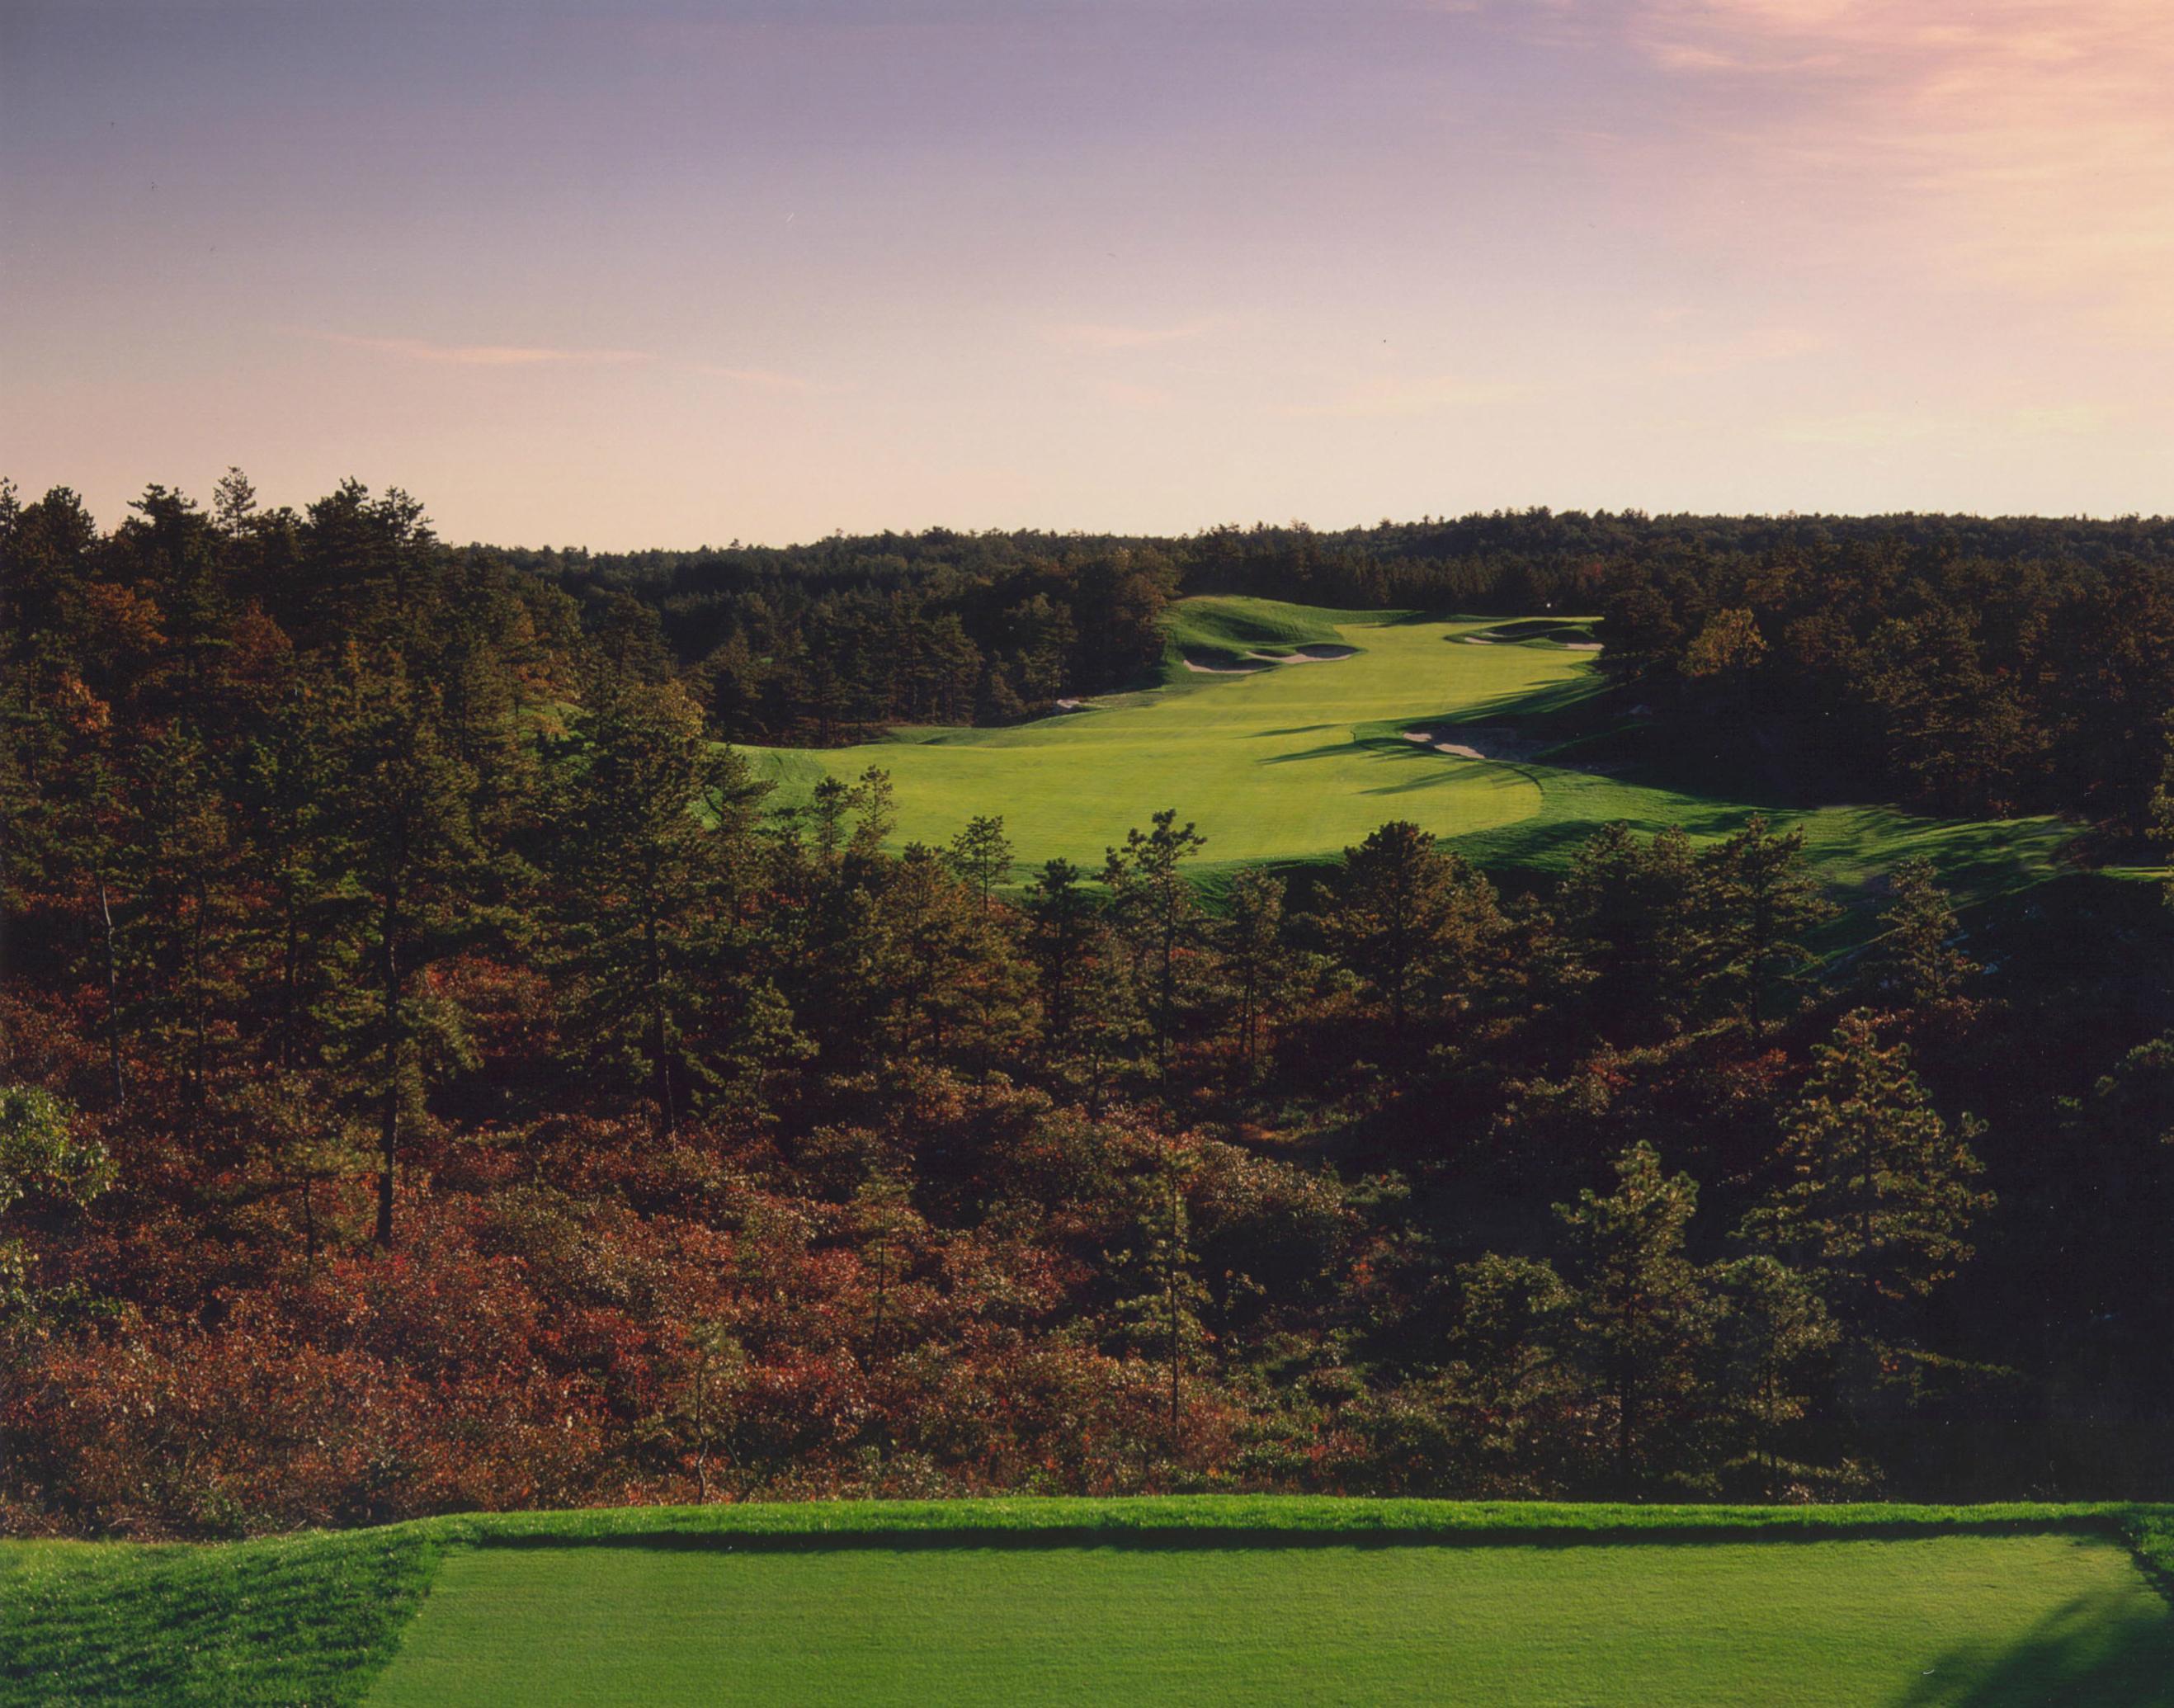 Rees Jones Course at Pinehills Golf Club